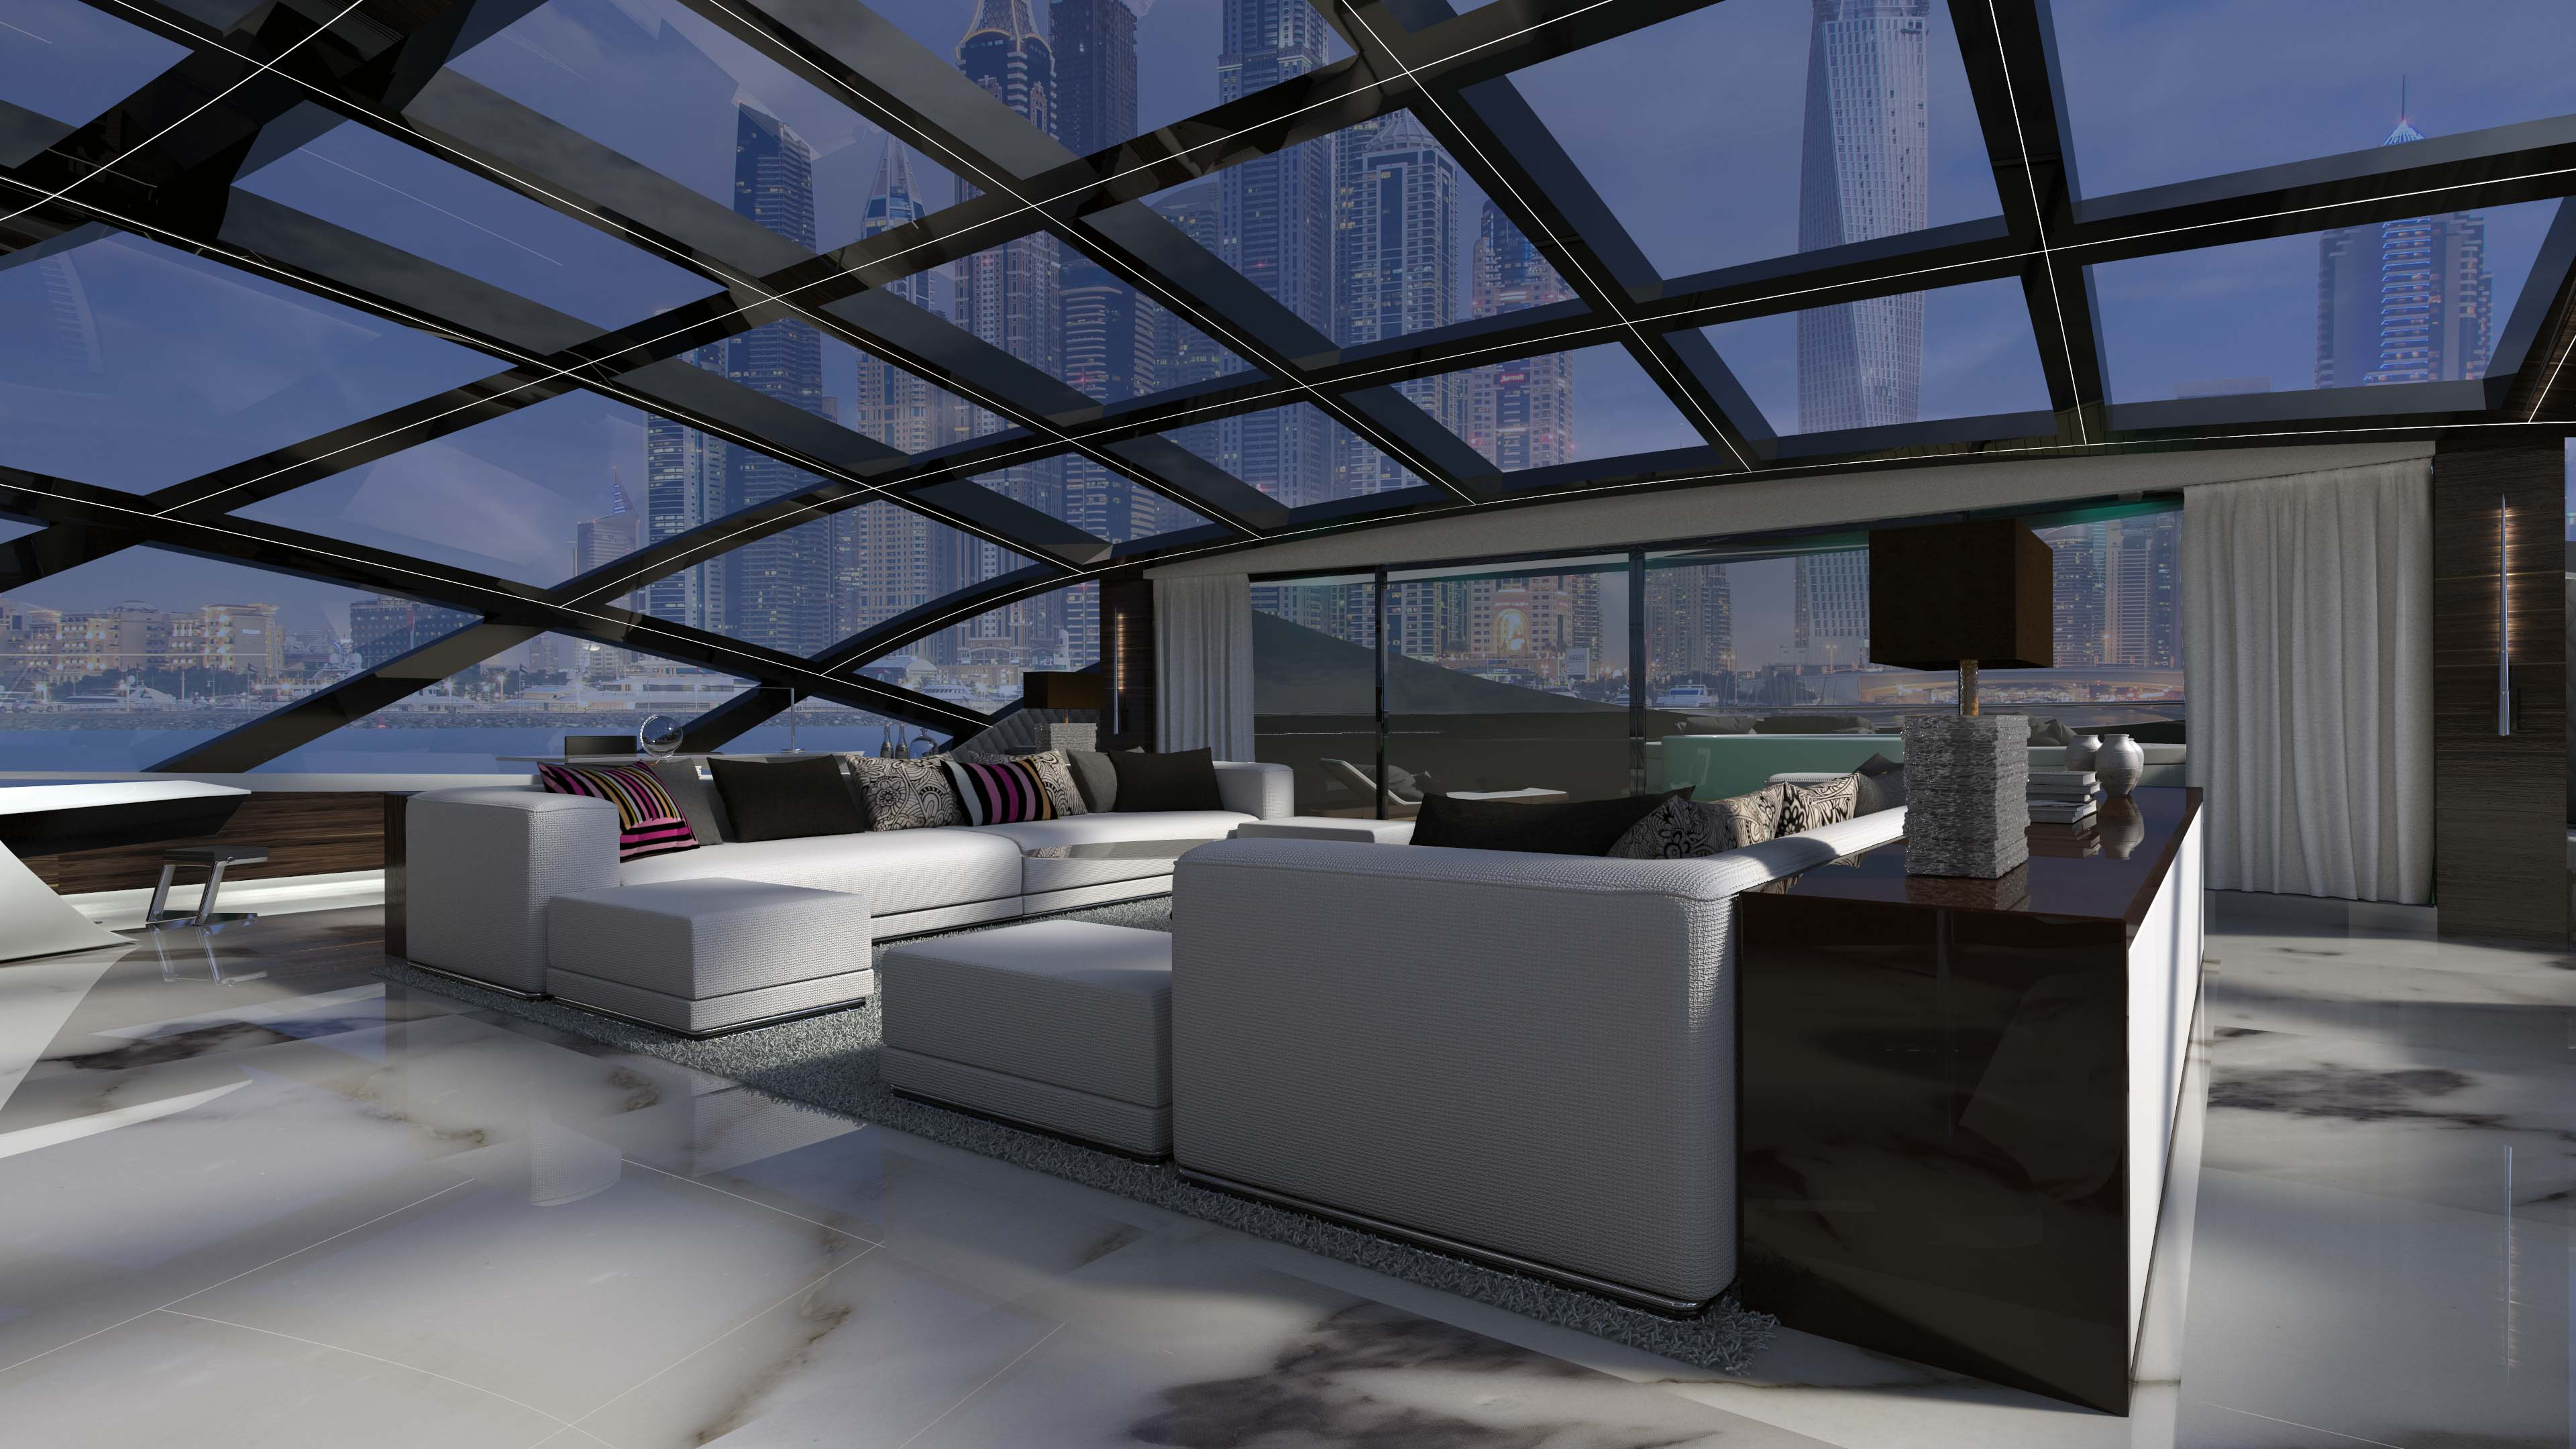 Cosmos explorer yacht concept from Luiz DeBasto and Oceanco